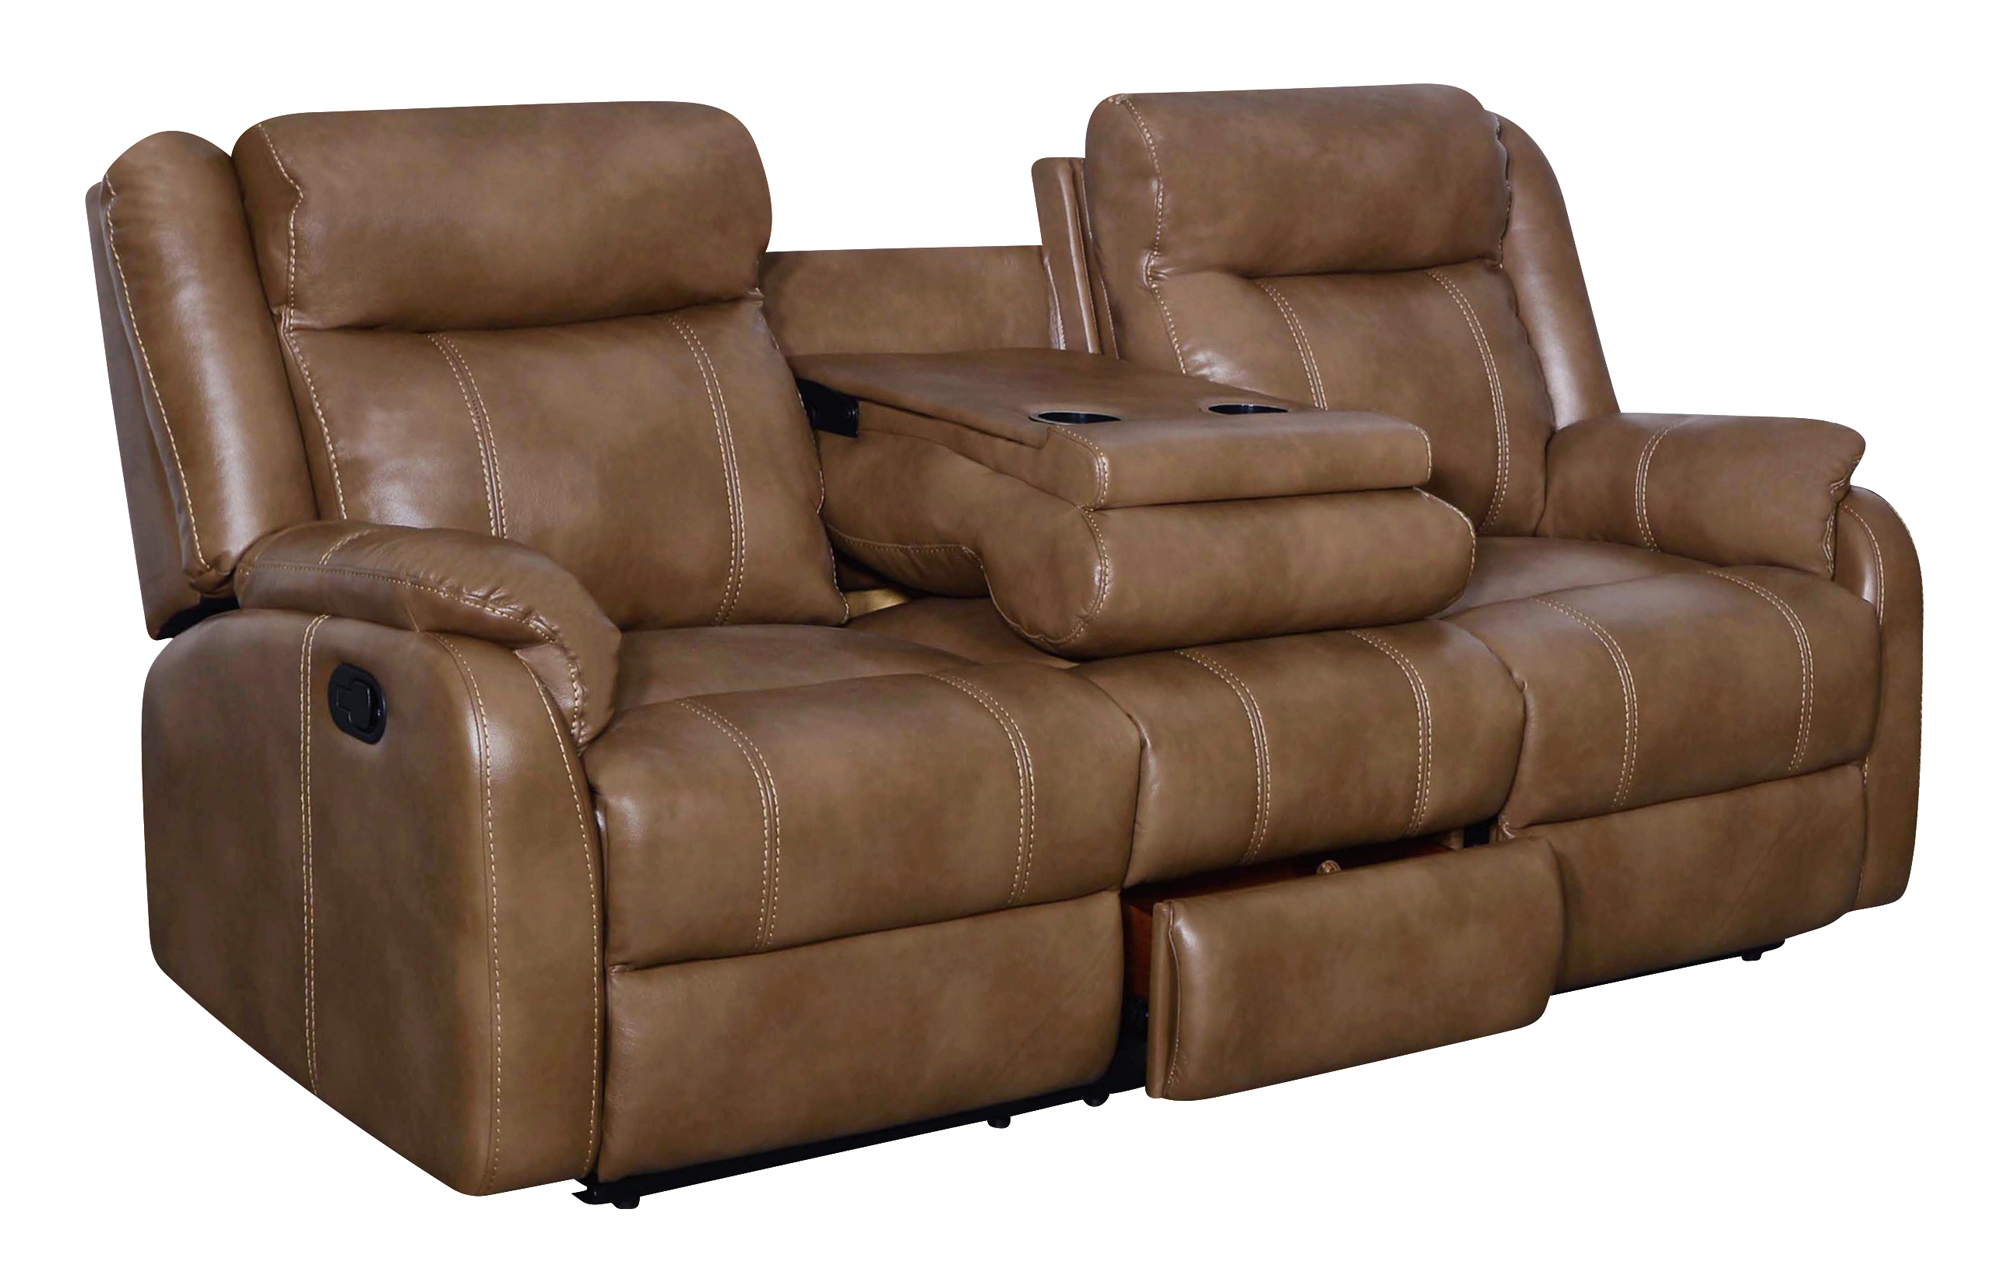 u7303c walnut leather gel reclining sofa w ddt dr by global furniture. Black Bedroom Furniture Sets. Home Design Ideas